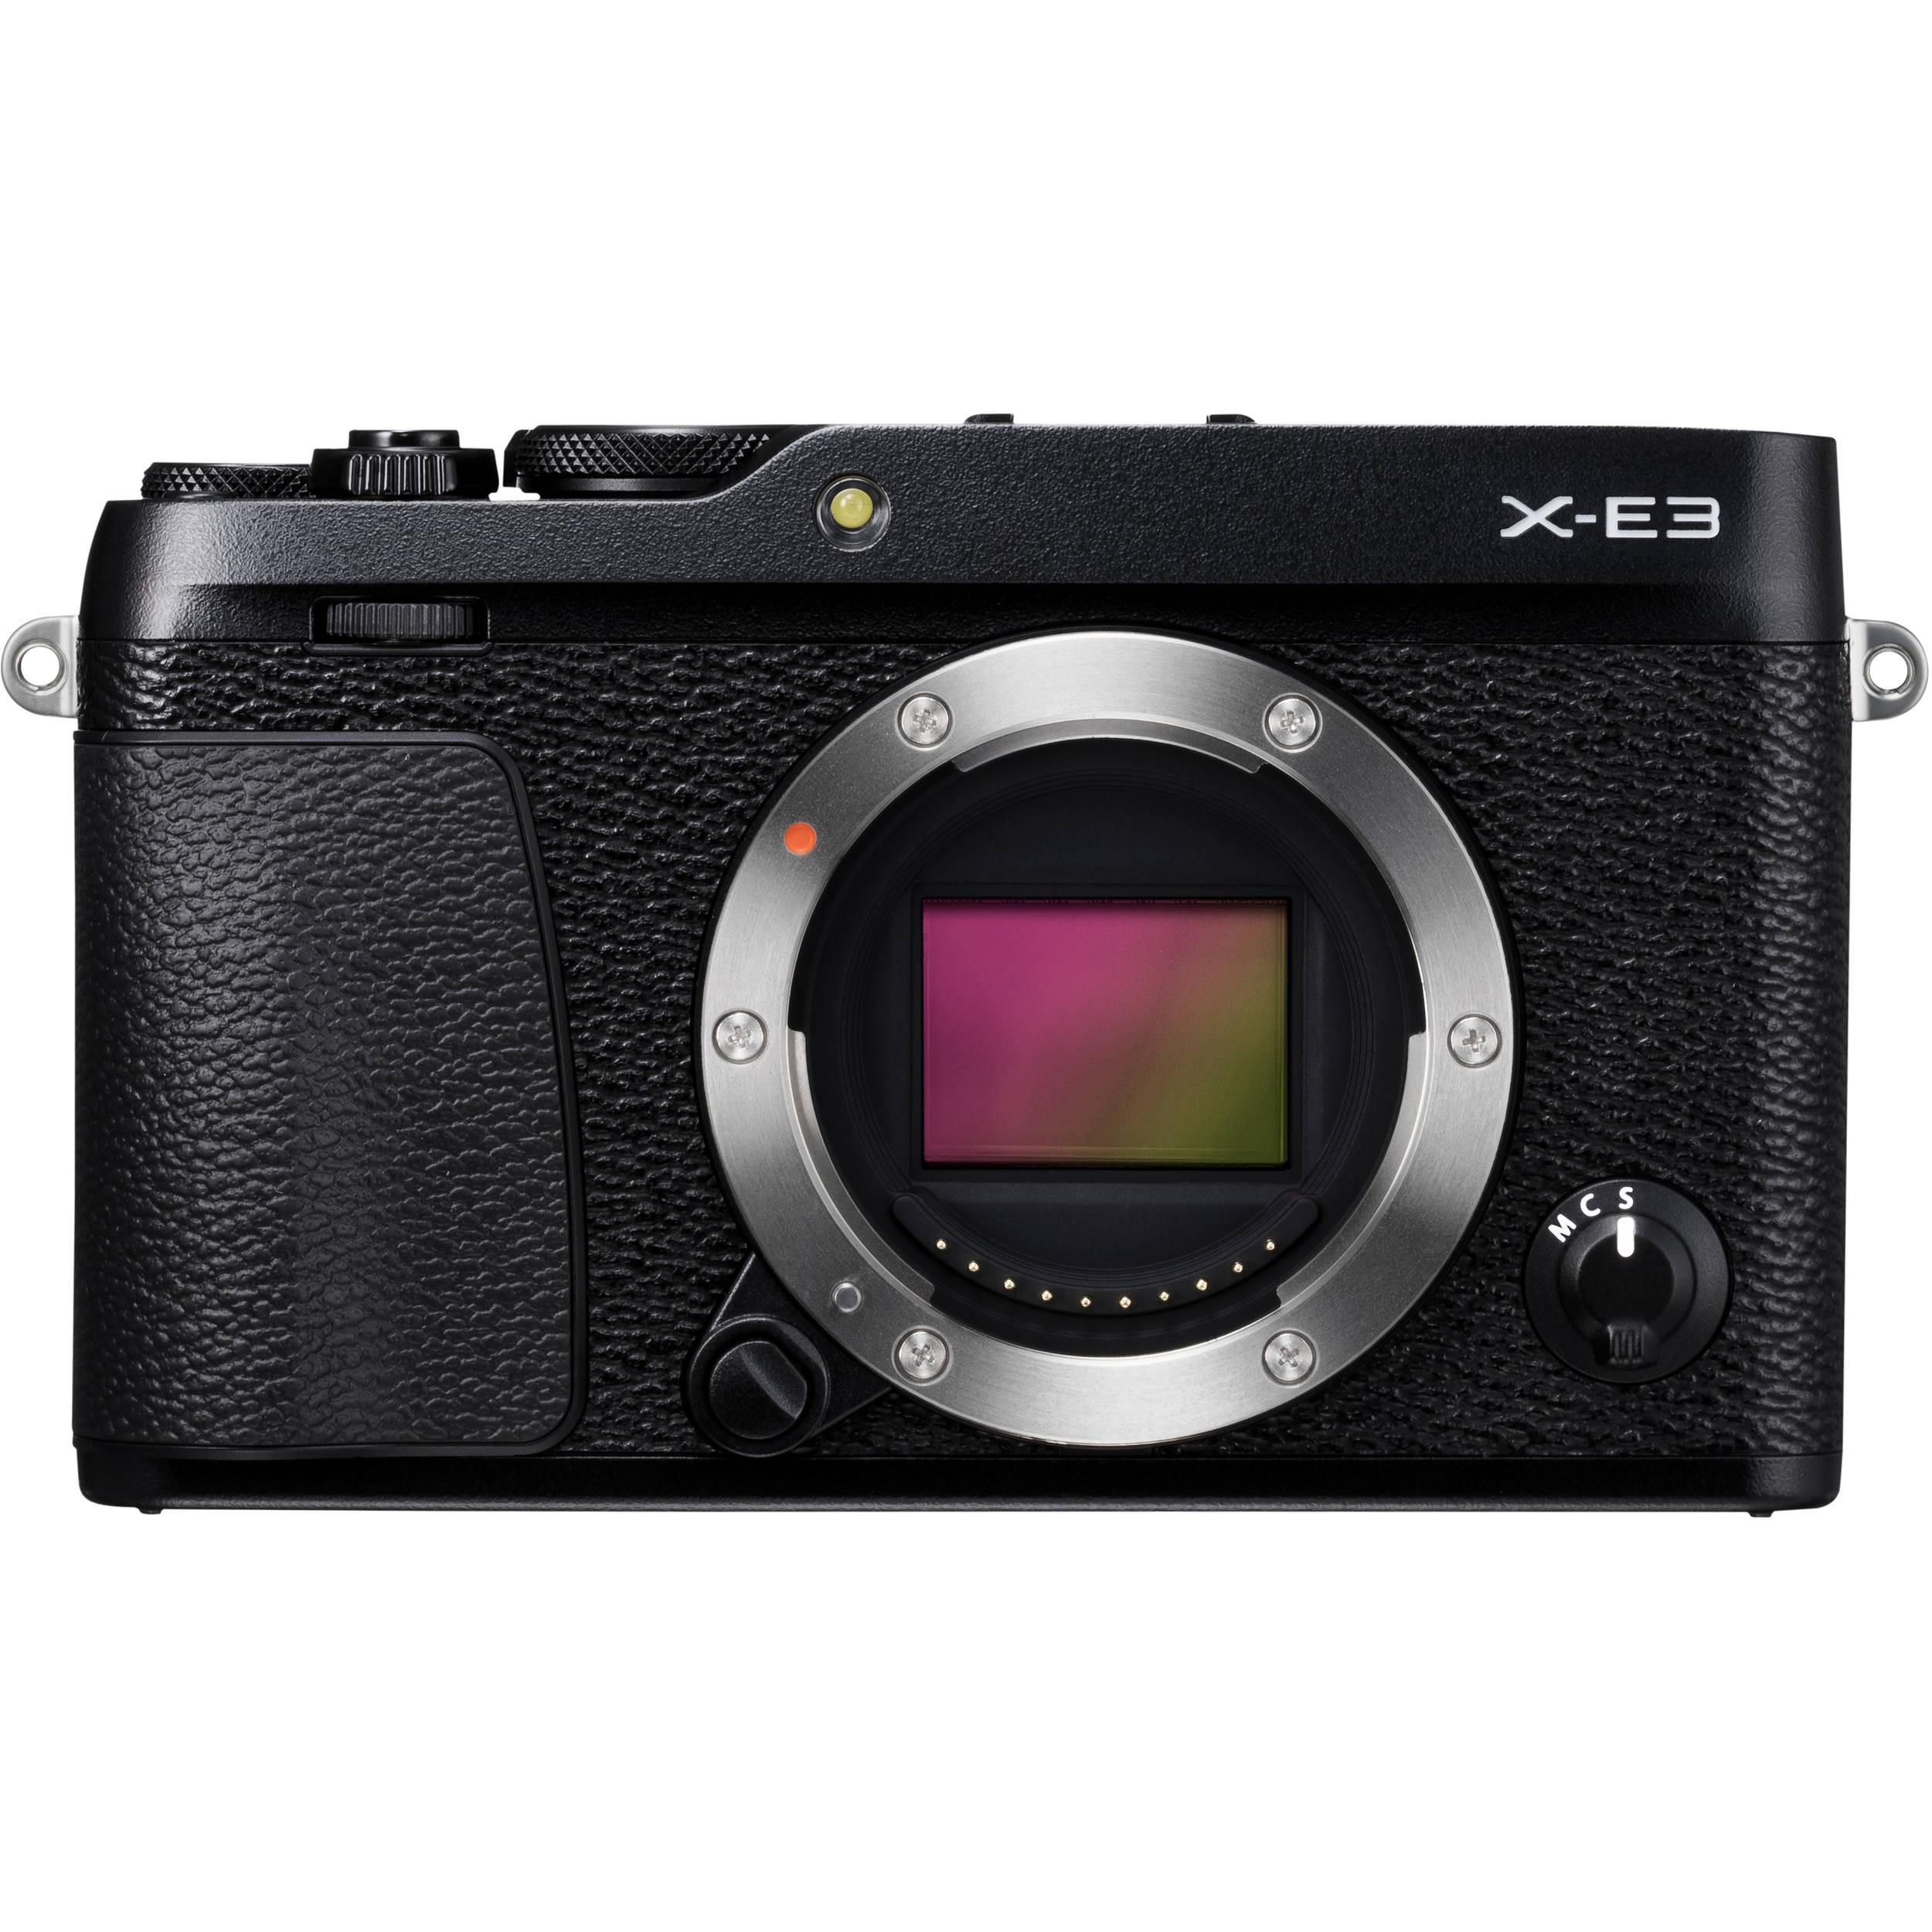 Fujifilm X E3 Mirrorless Digital Camera 16558530 Bh Photo Video X100s Iphone 5 Custom Hard Case Body Only Black